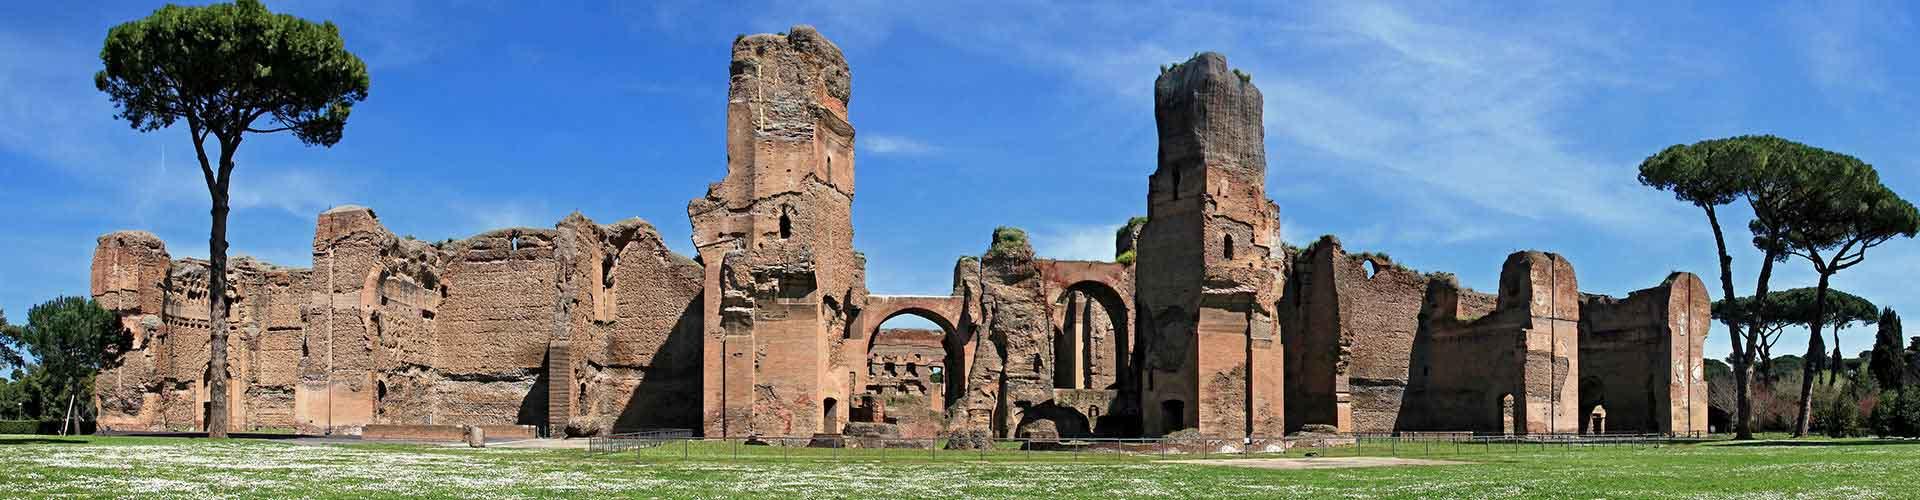 Roma - Albergues cerca a Termas de Caracalla. Mapas de Roma, Fotos y Comentarios para cada Albergue en Roma.